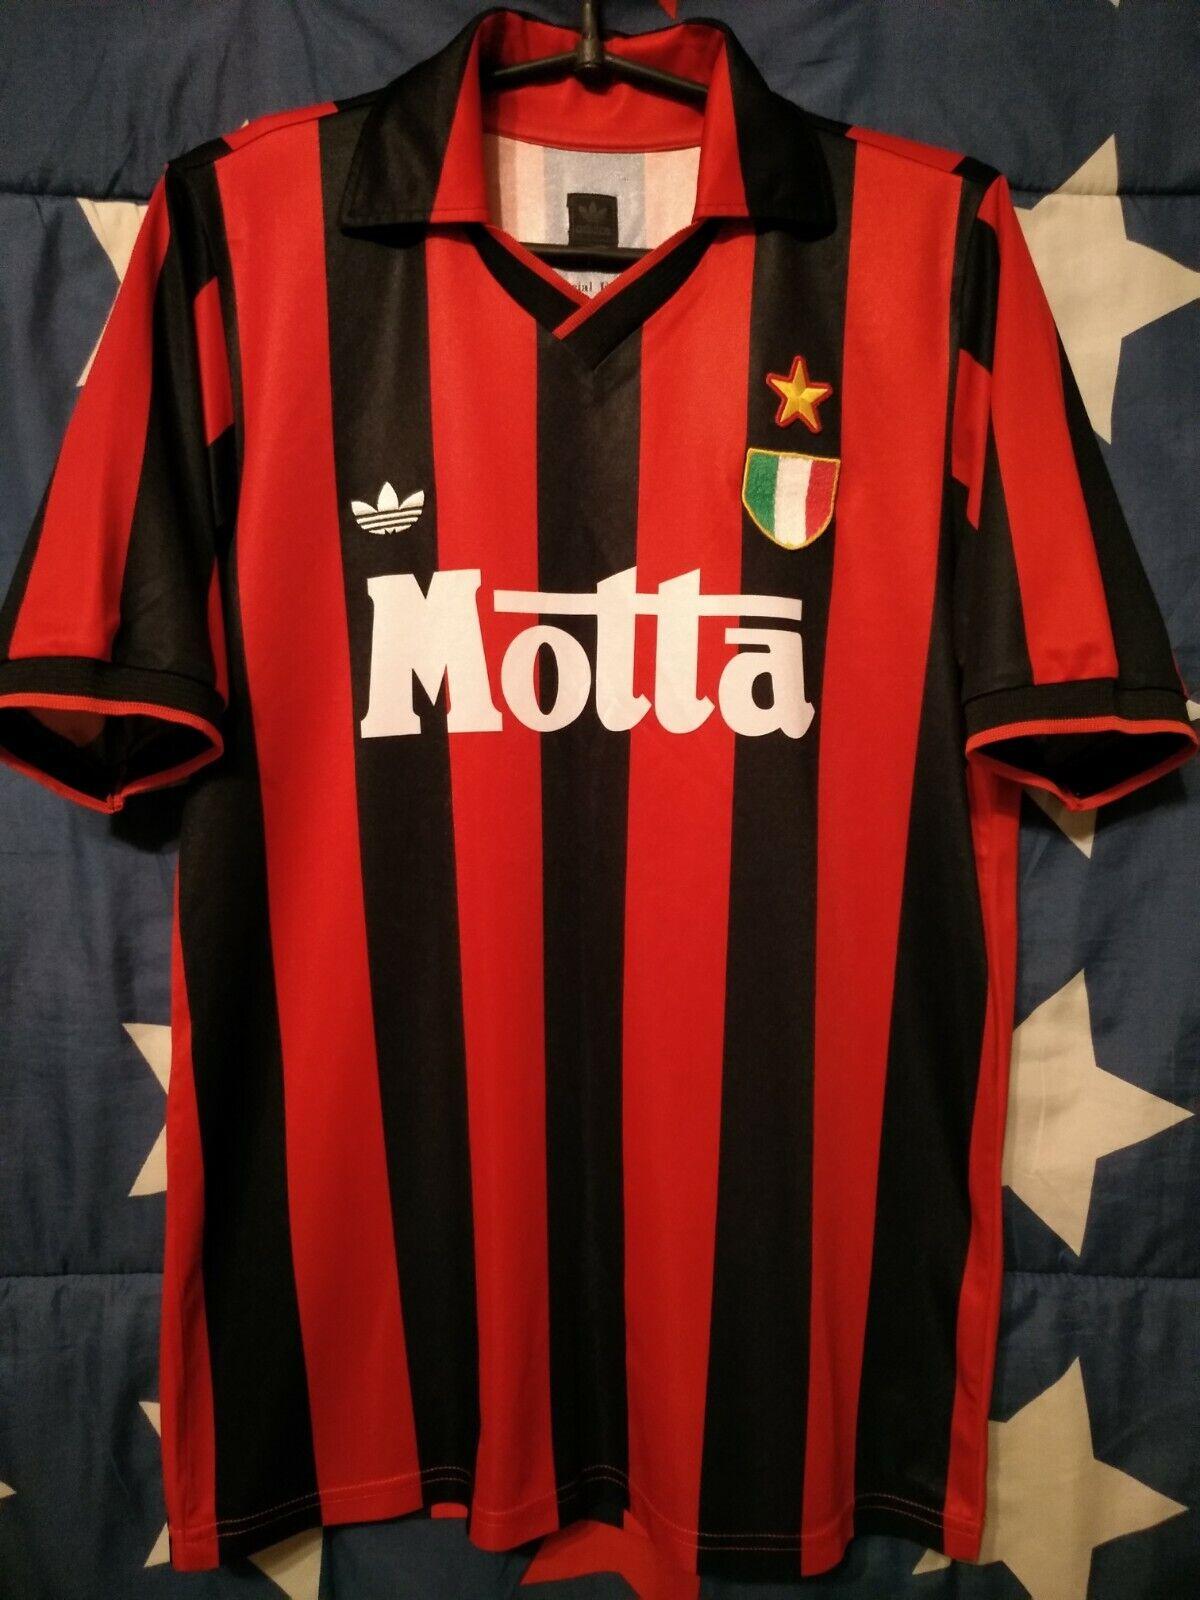 Talla S AC Milan  1992-1993 Adidas Motta Special Edition Home Football Shirt